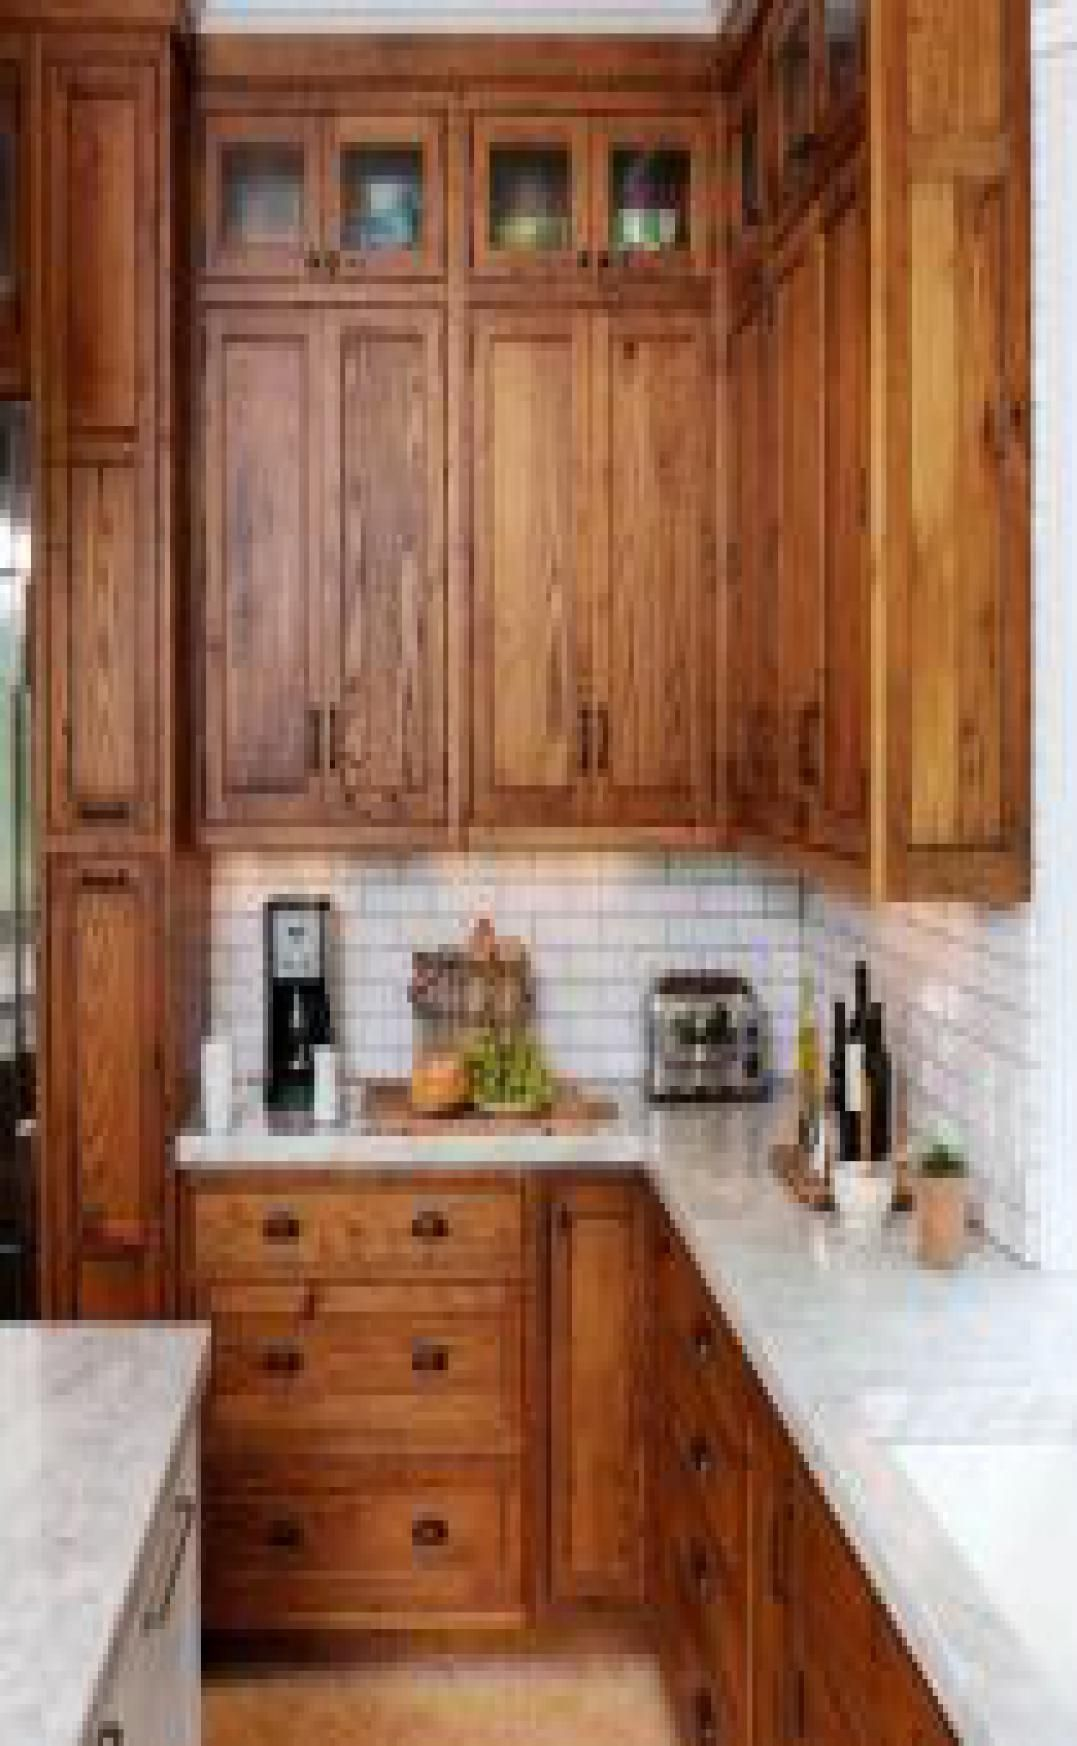 Kitchen Needs Some Tlc Kitchen Flipping Houses Kitchen Appliances